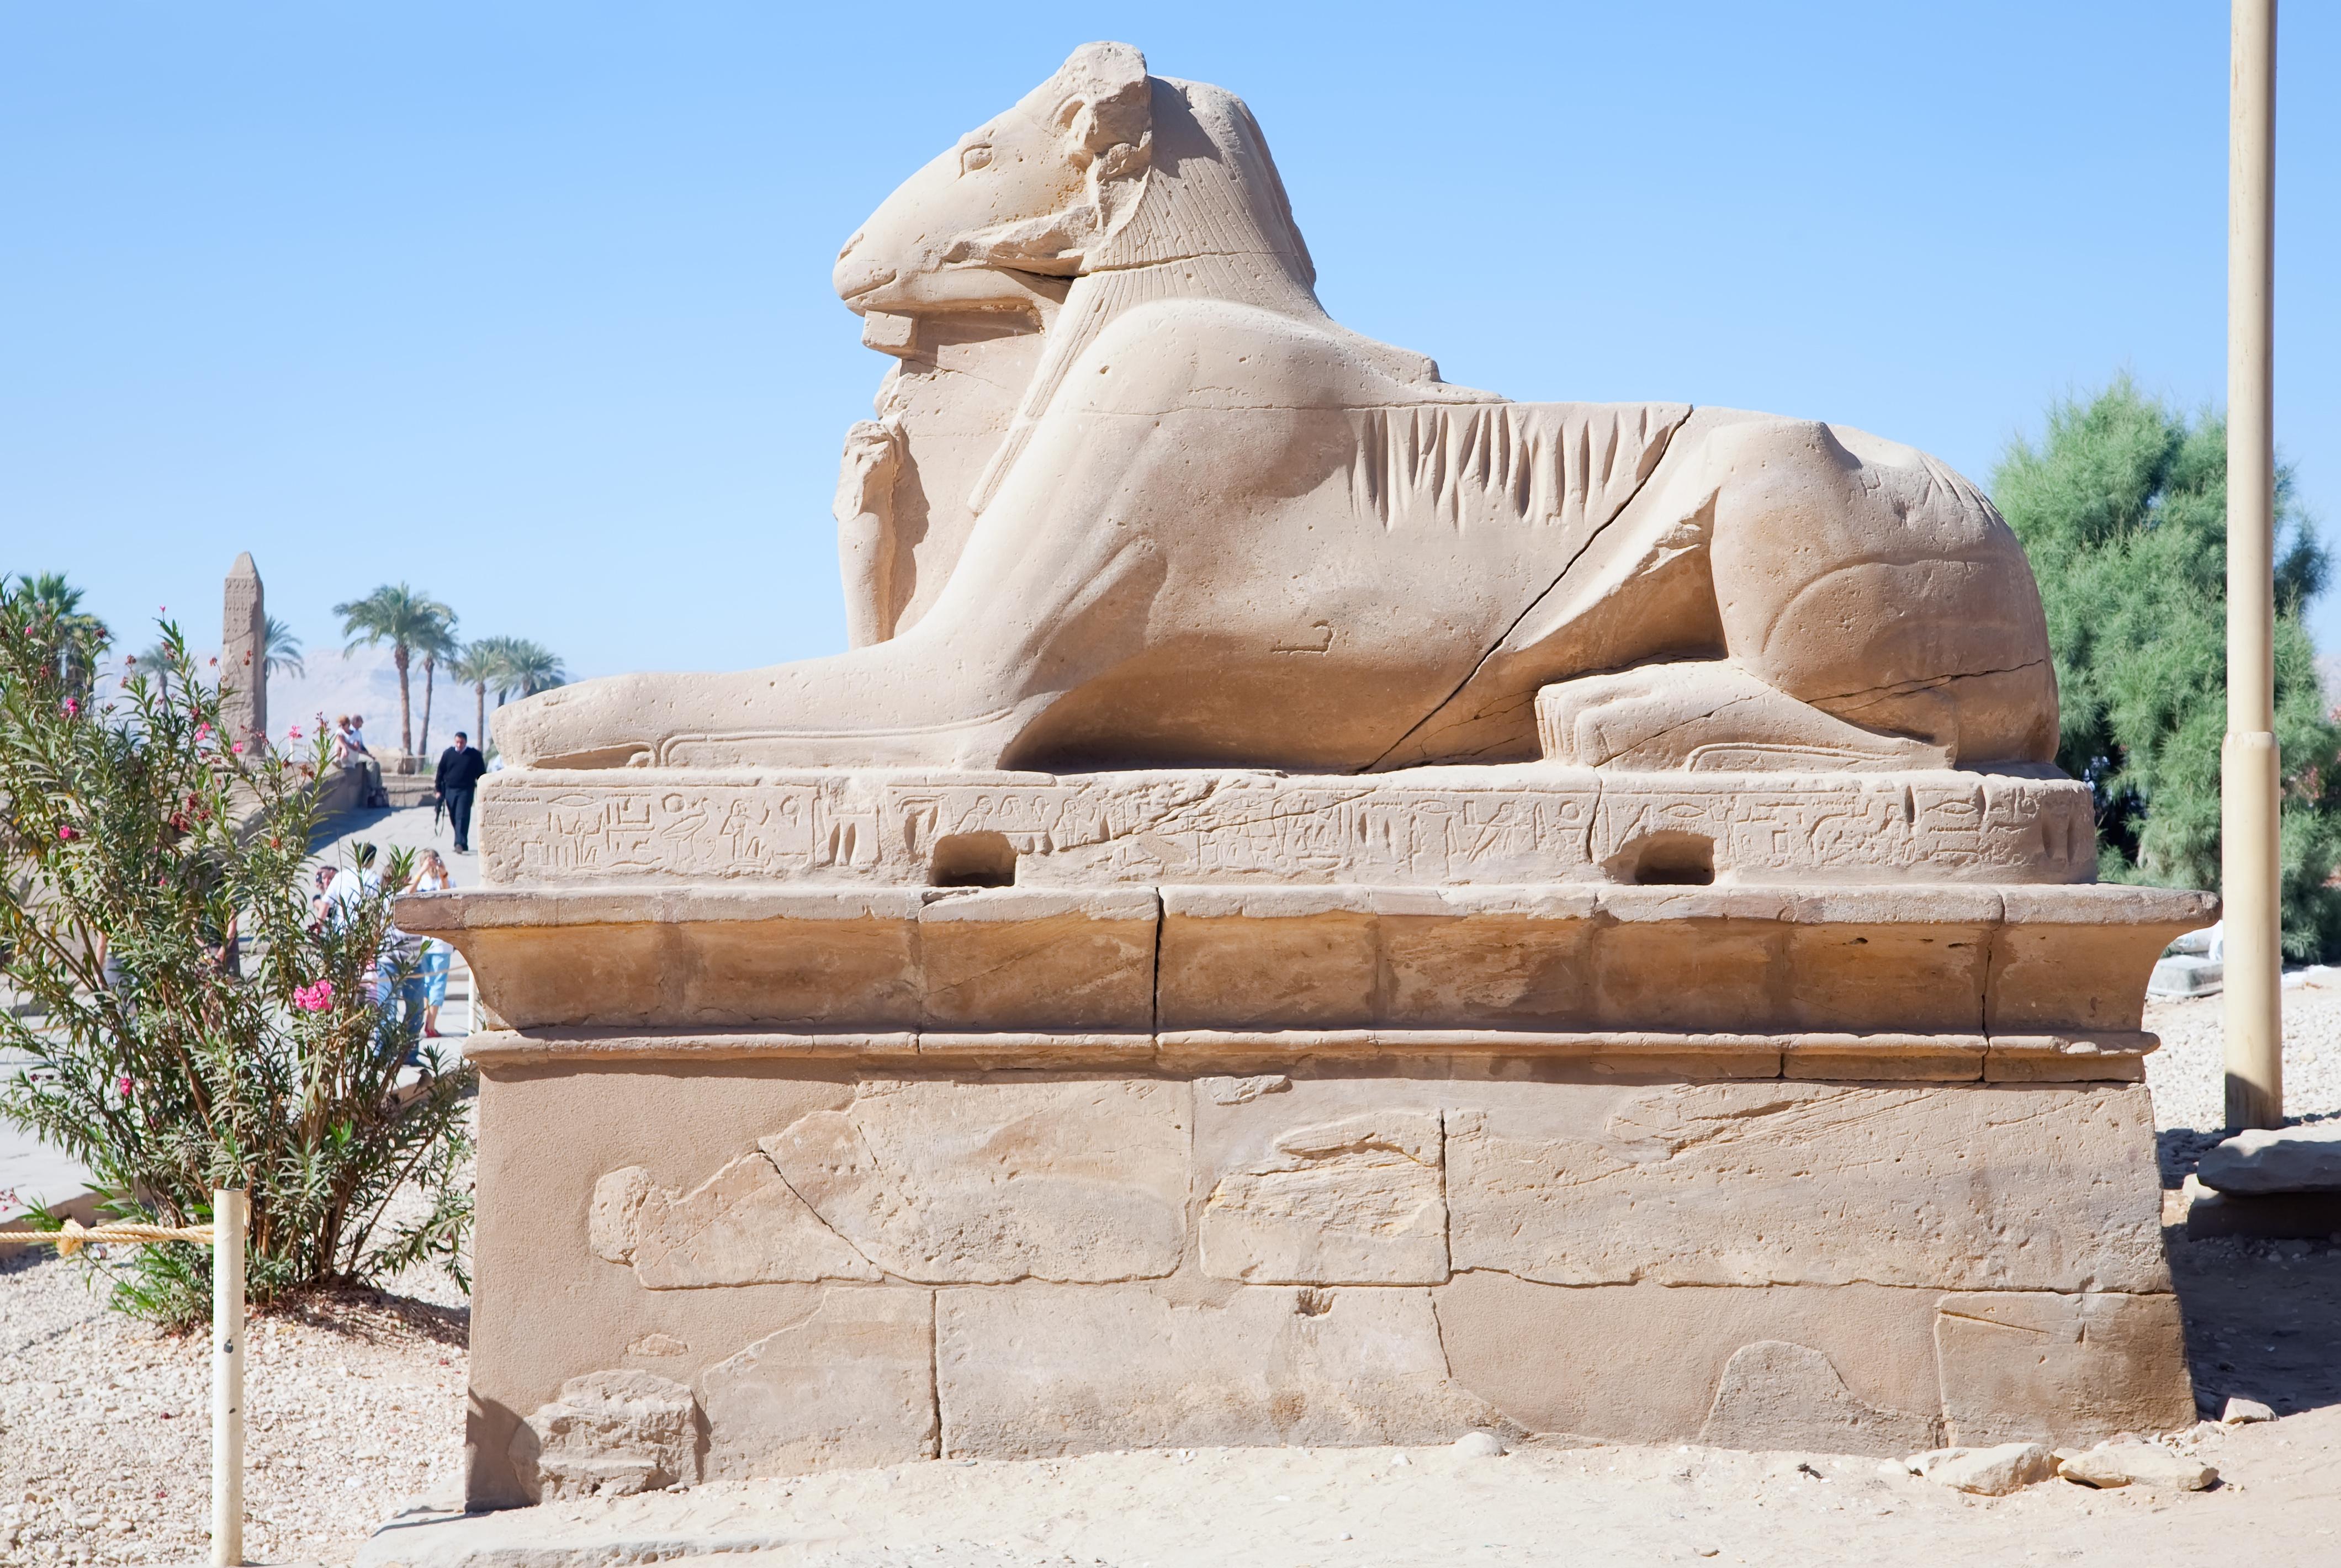 Ram-headed sphinxes at Karnak temple